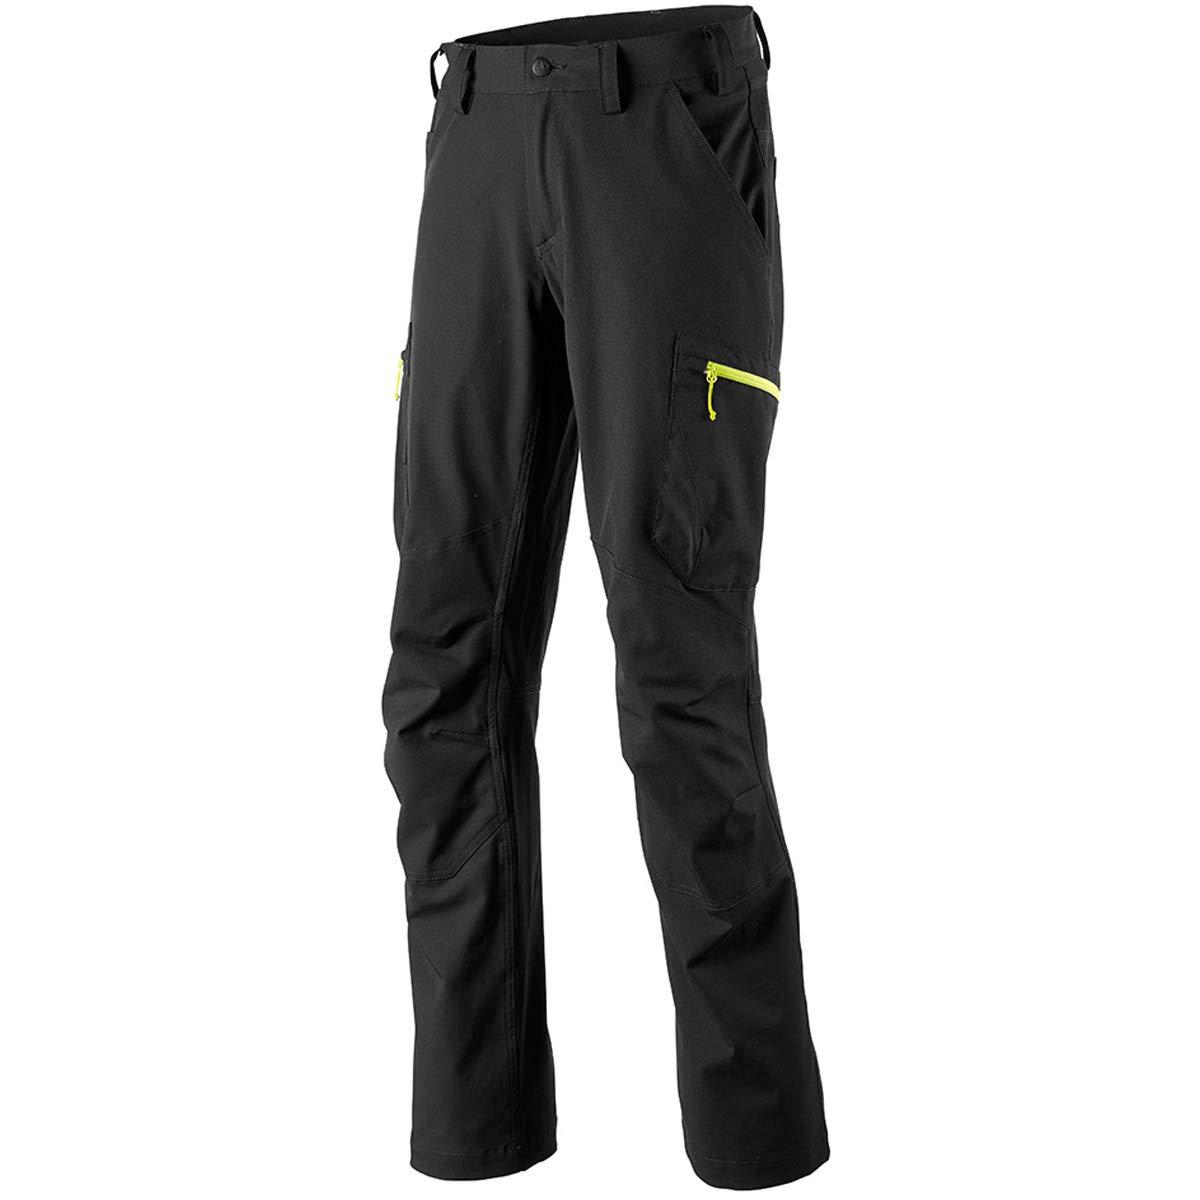 Haix Active Pro Pants, Farbe:schwarz, Größe:54